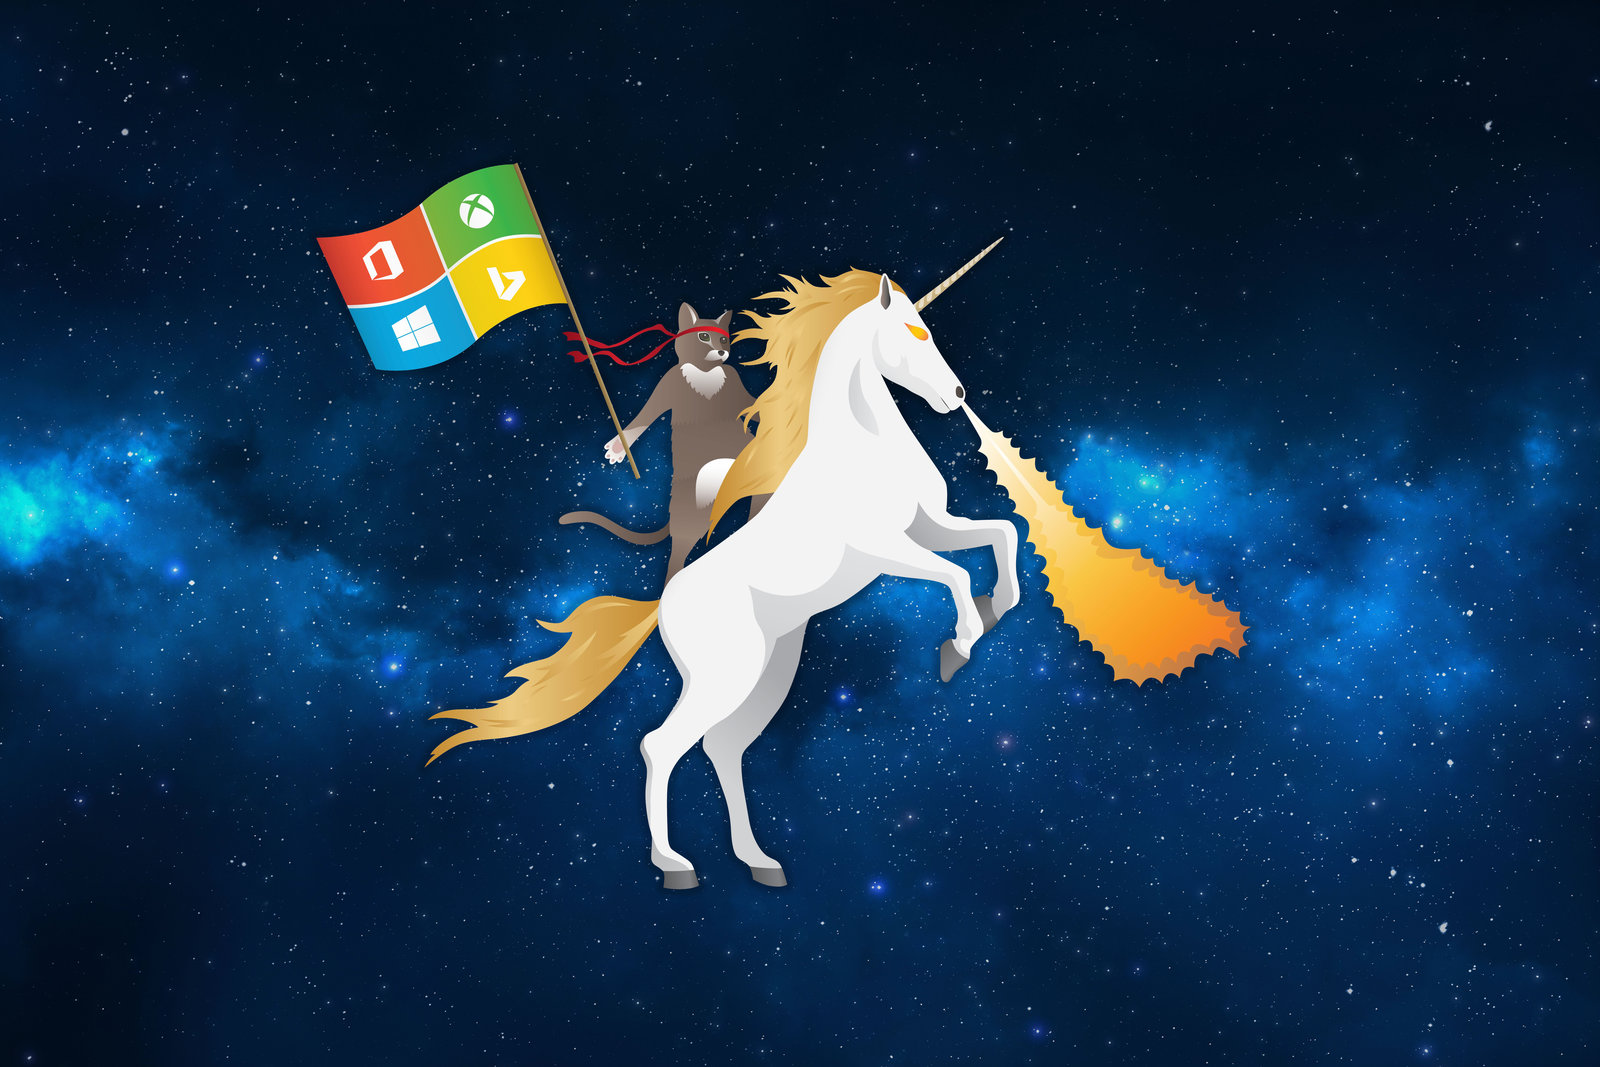 MS Ninja Cat Riding Unicorn Space Blue by flothegangsta 1600x1067